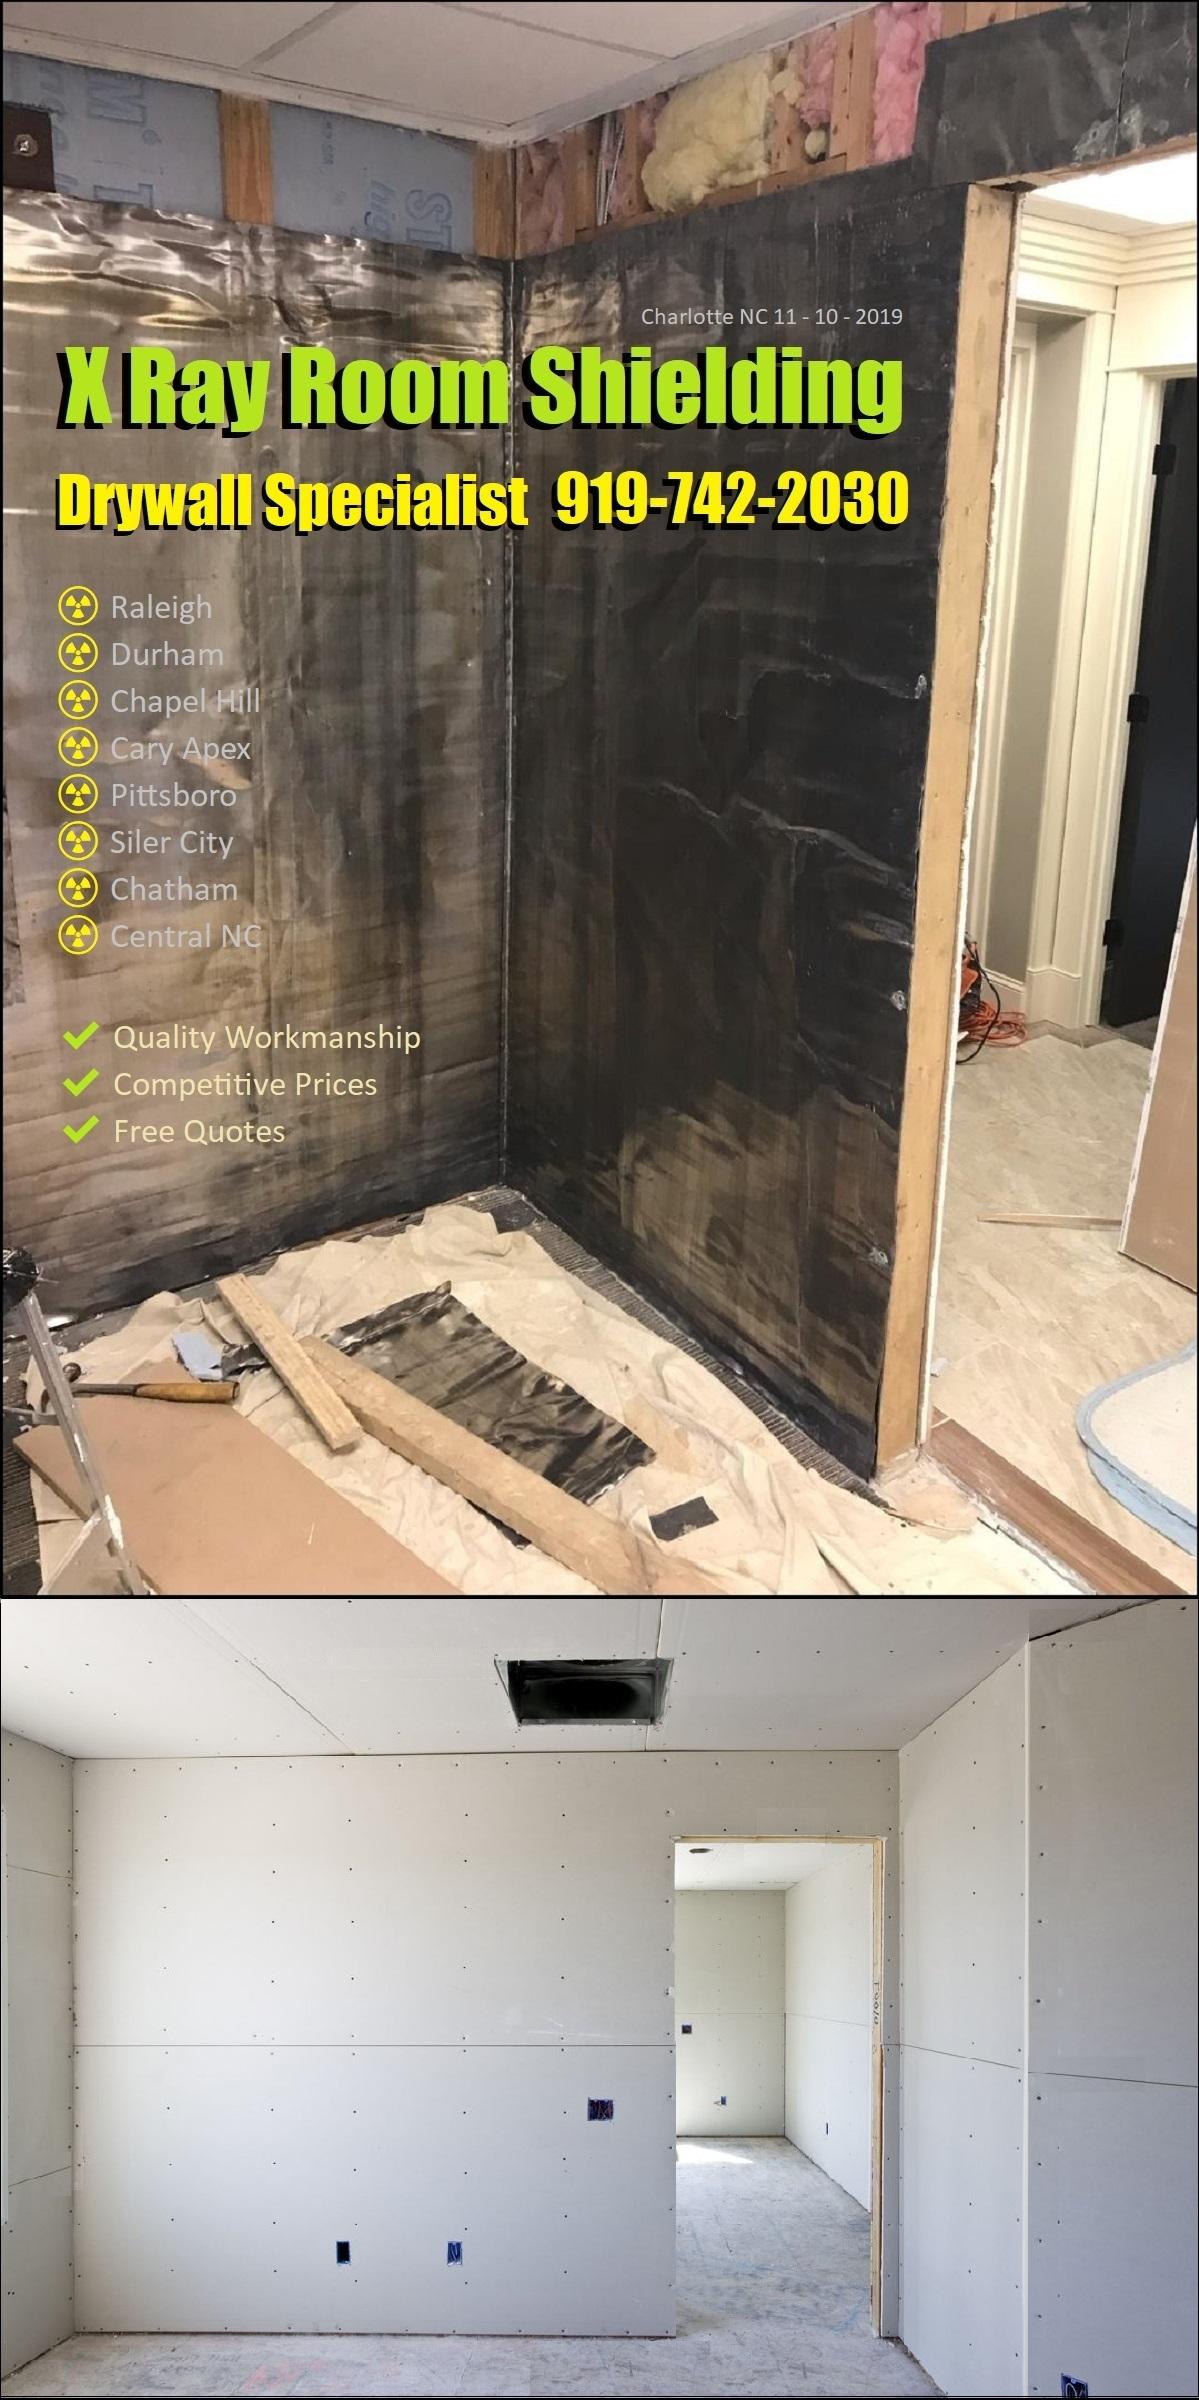 Nextdoor Wallboard Hanger Finisher Repair And Popcorn Texture Removal Soundproofing Contractor | North Carolina